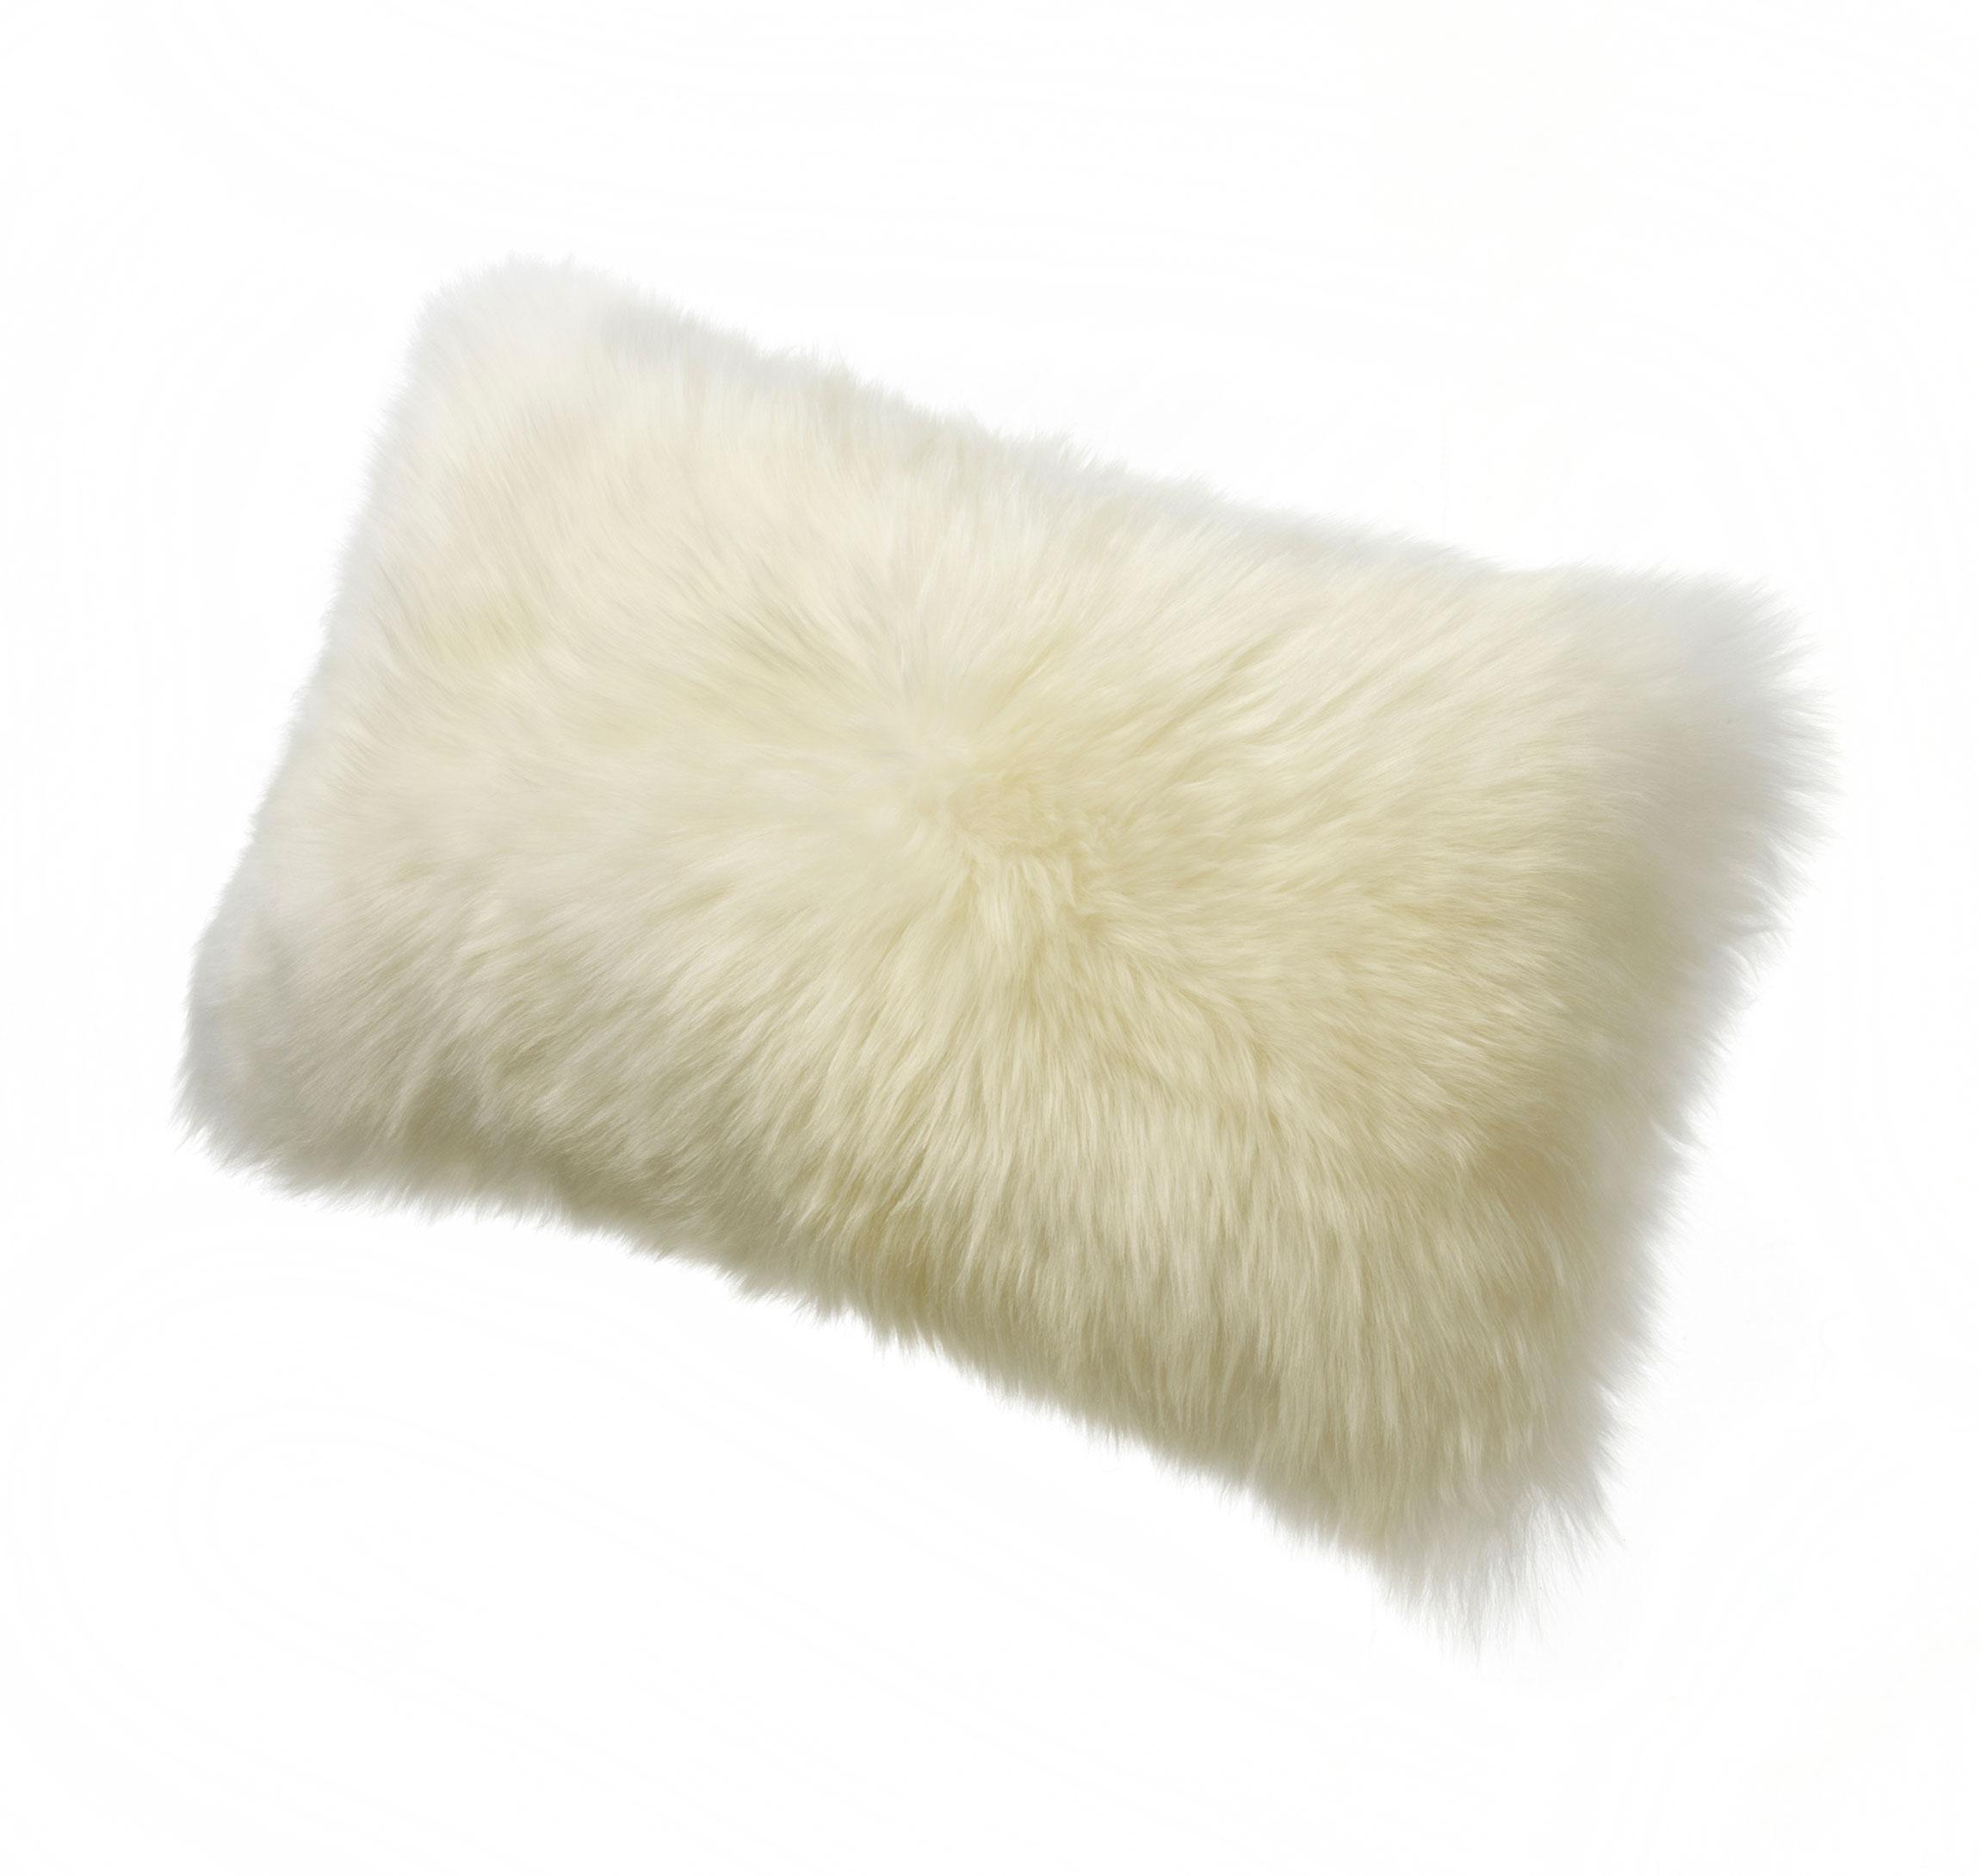 Sheepskin Kidney Pillow Ivory